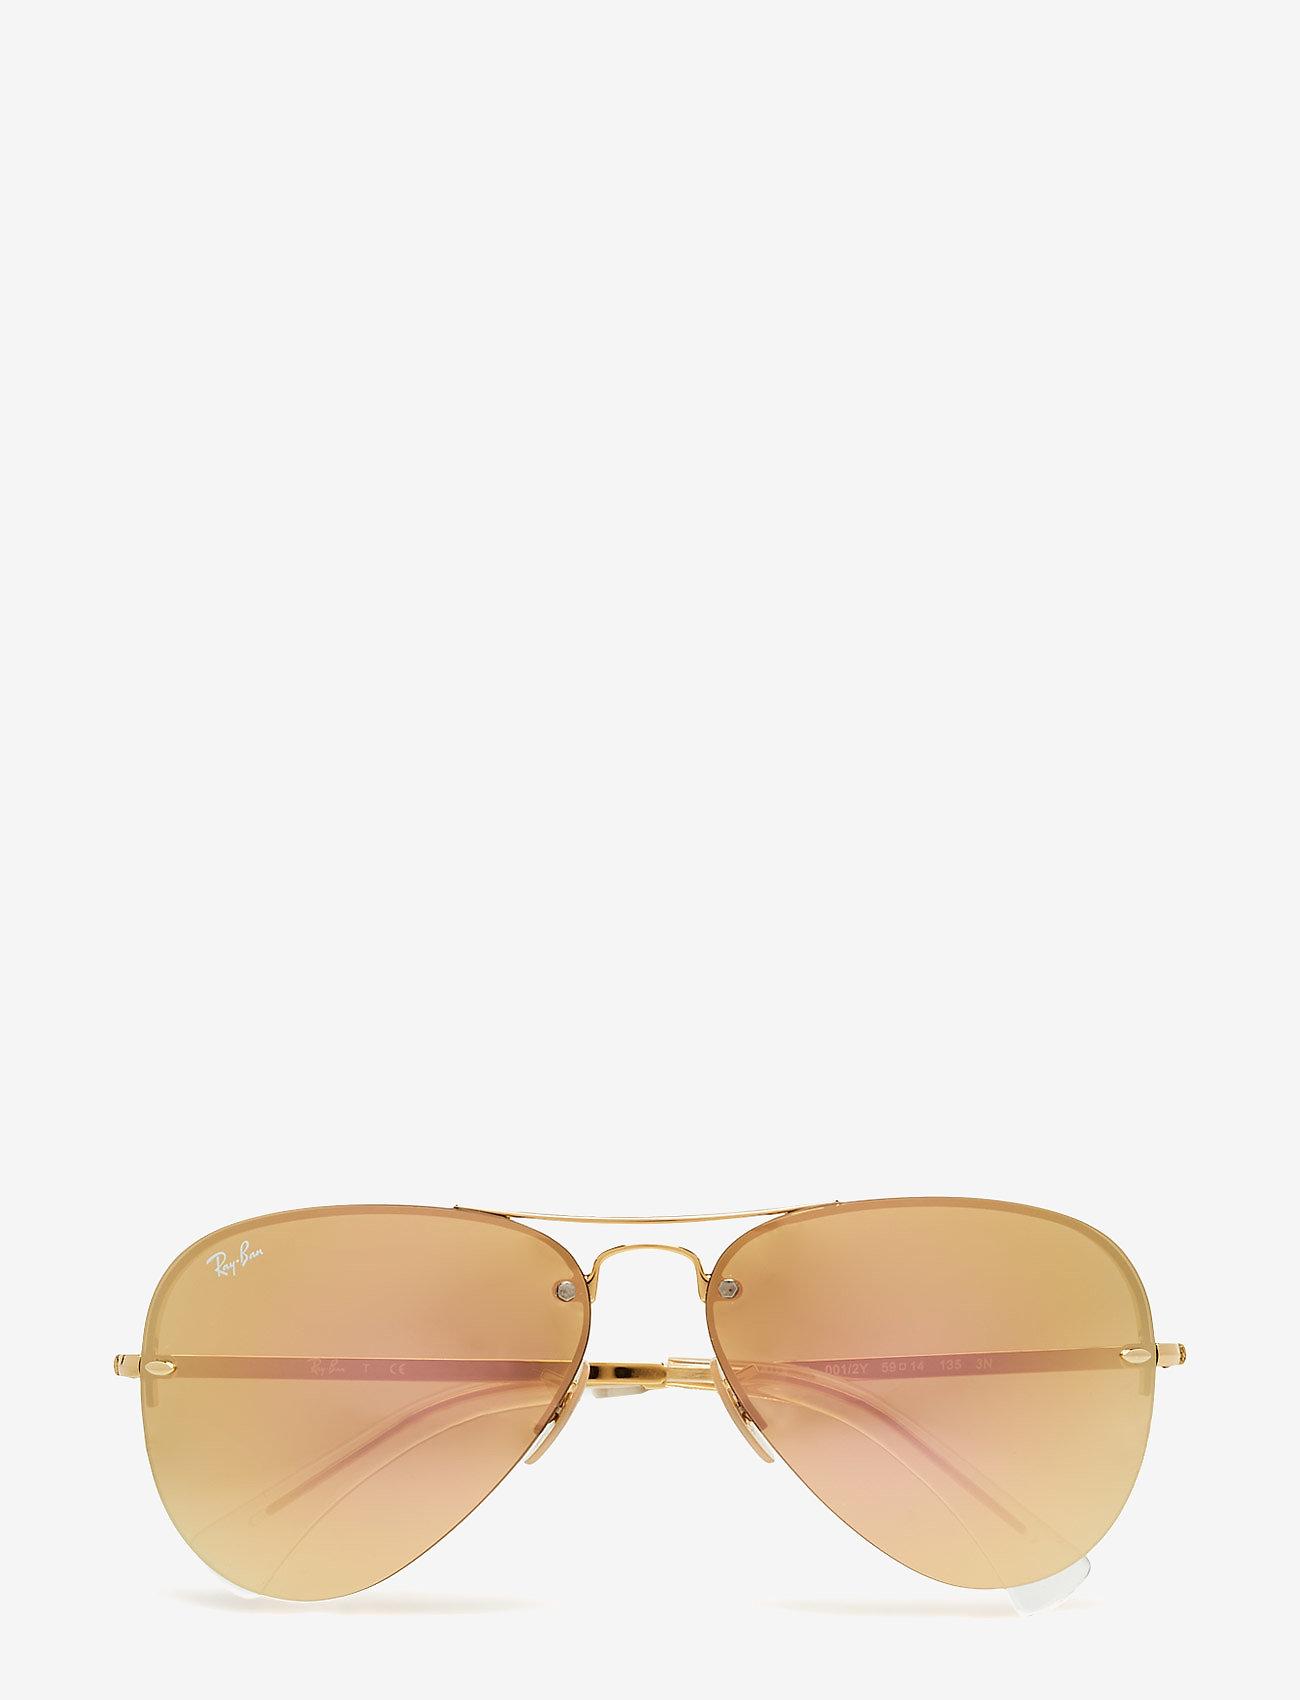 Ray-Ban - Aviator - aviatora stila - gold-light brown mirror pink - 0